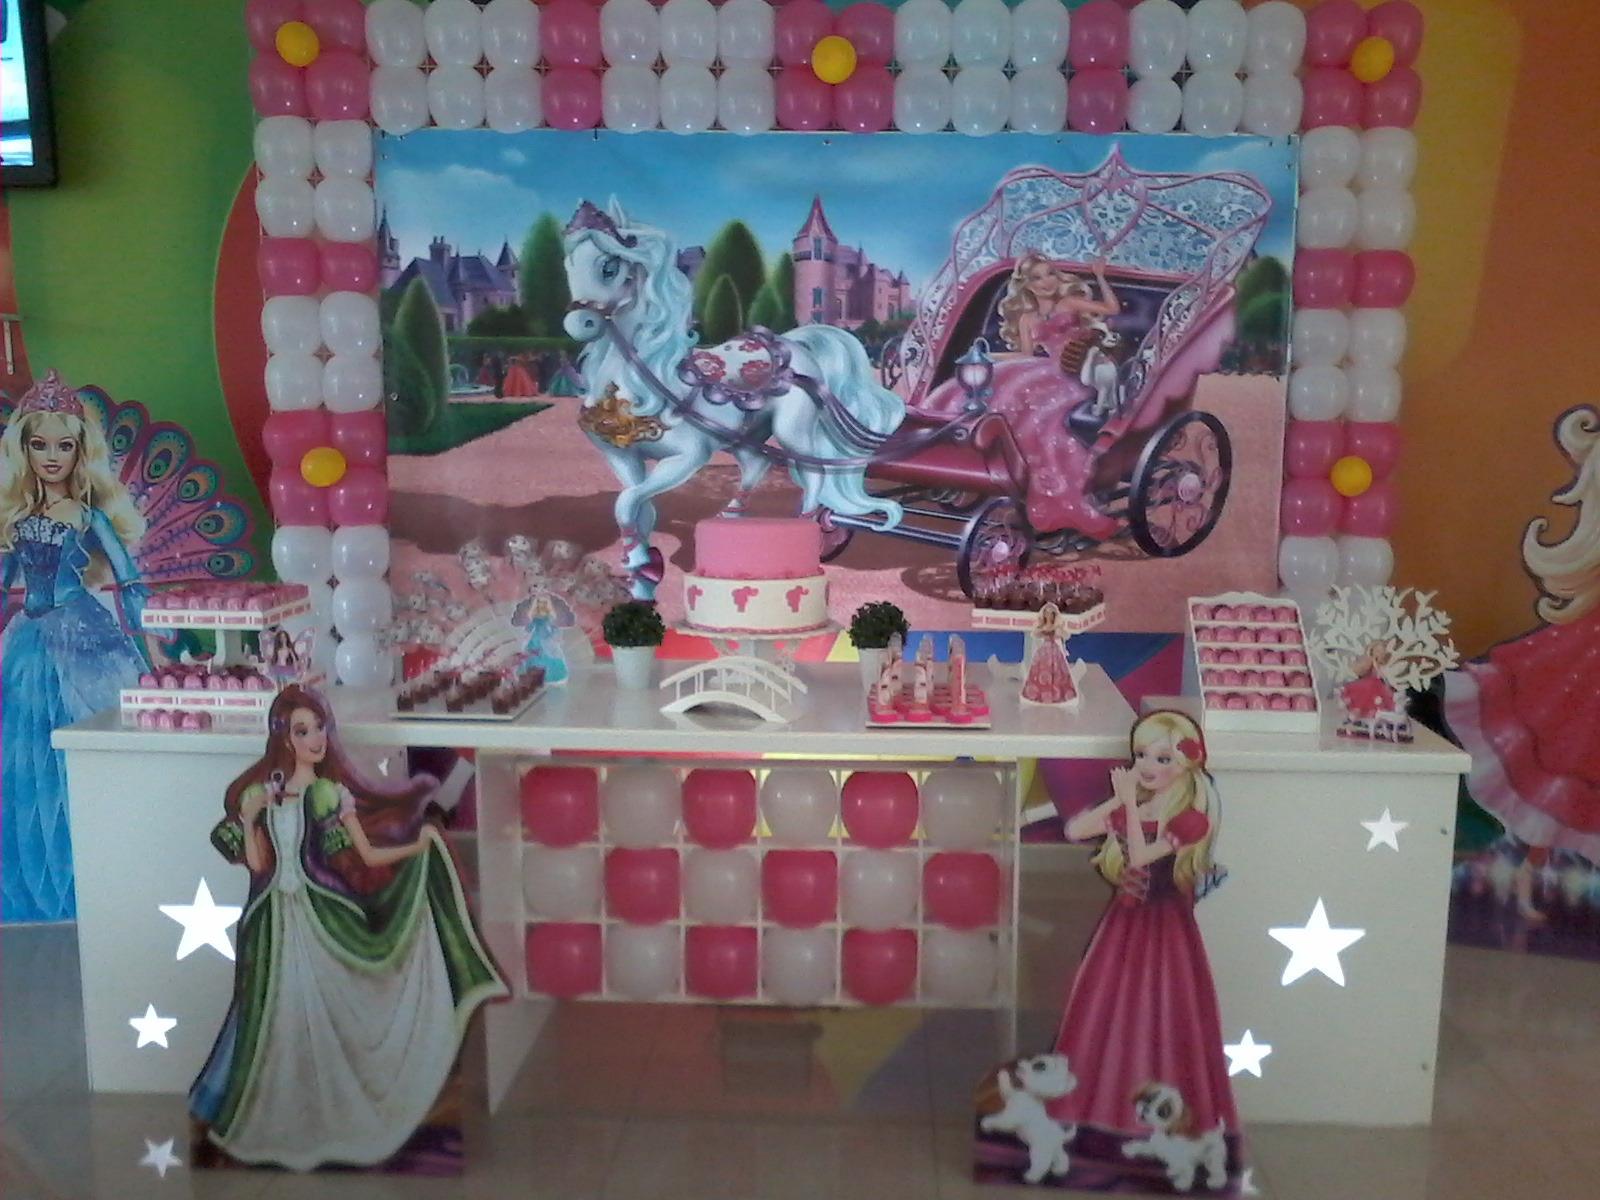 Decora??o Clean Barbie Clean decora??o Elo7